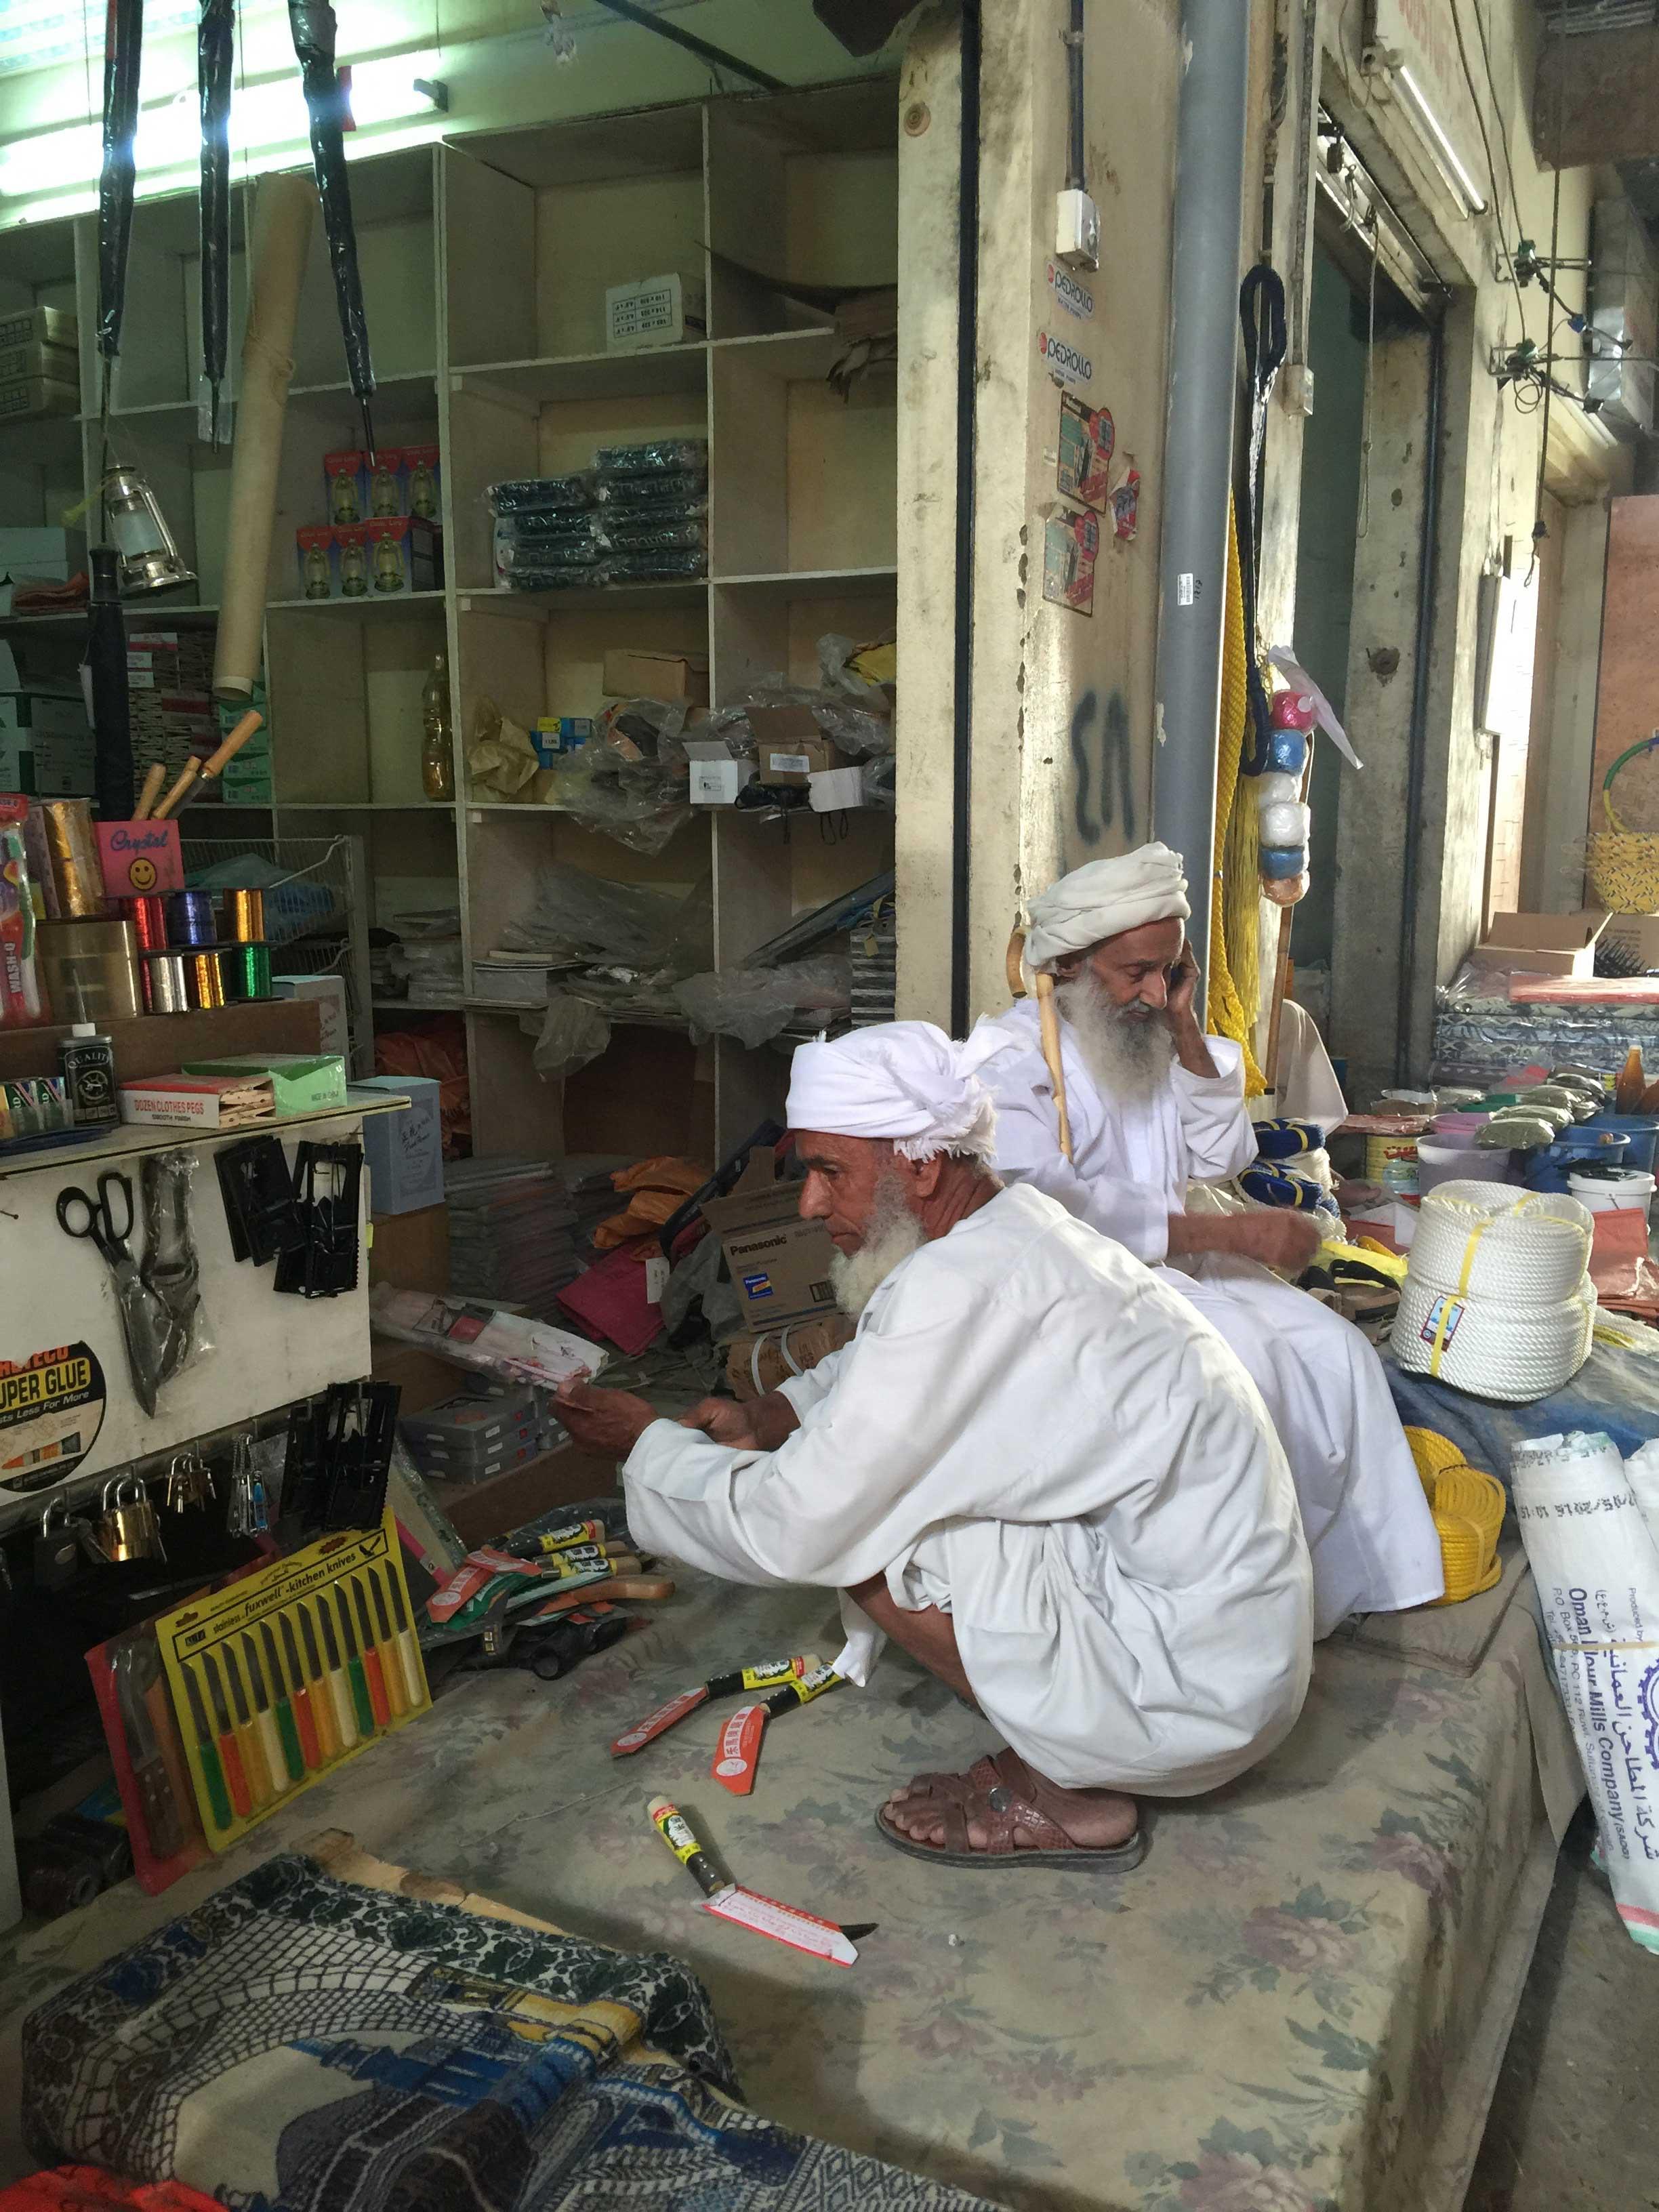 Oman: The Pearl of ArabiaArabia, the Gulf, and the GCC Blog